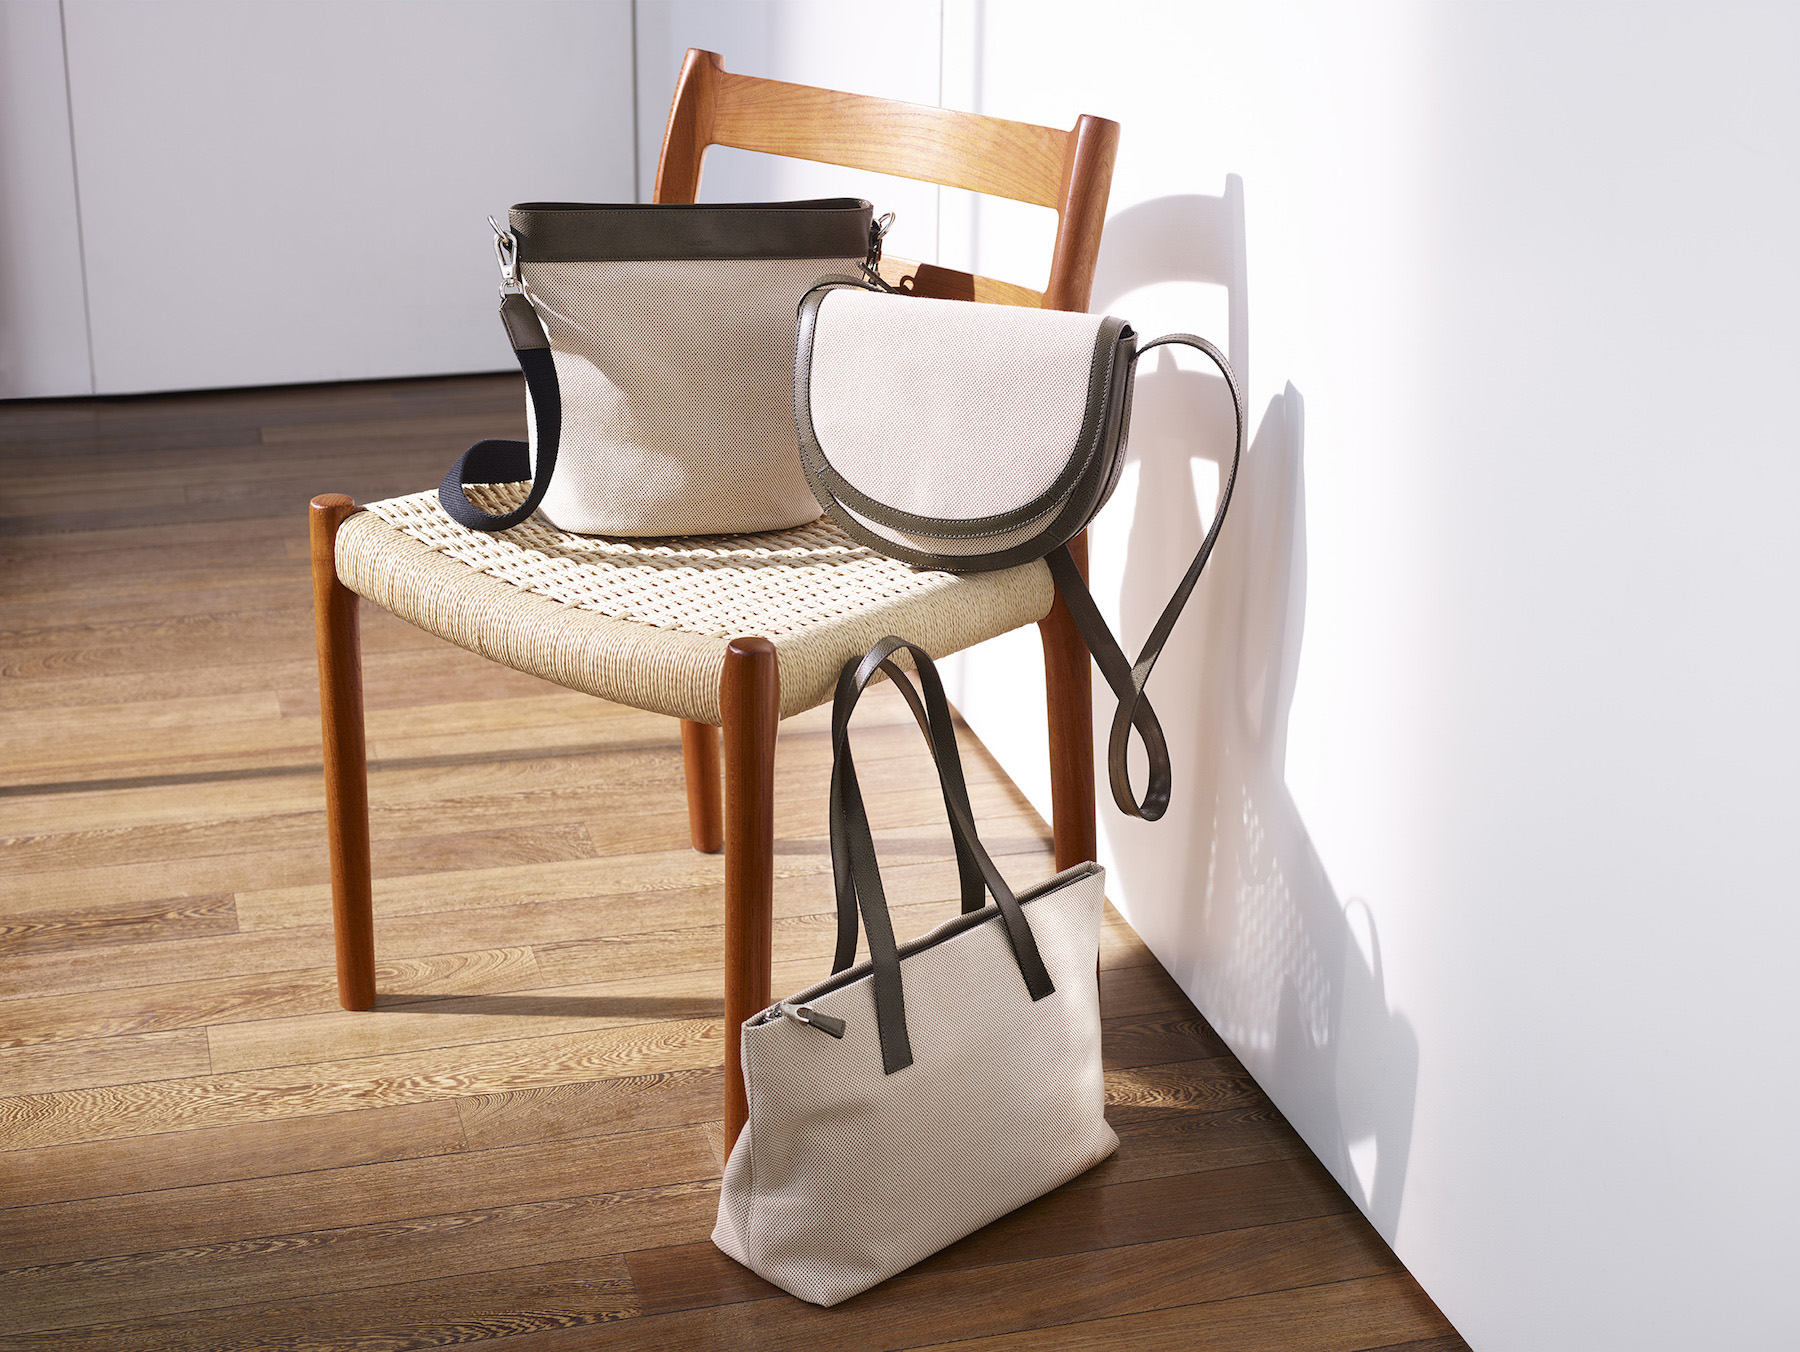 12-icon-artist-management-katie-hammond-advertising-jaeger-womens-handbags (1).jpg